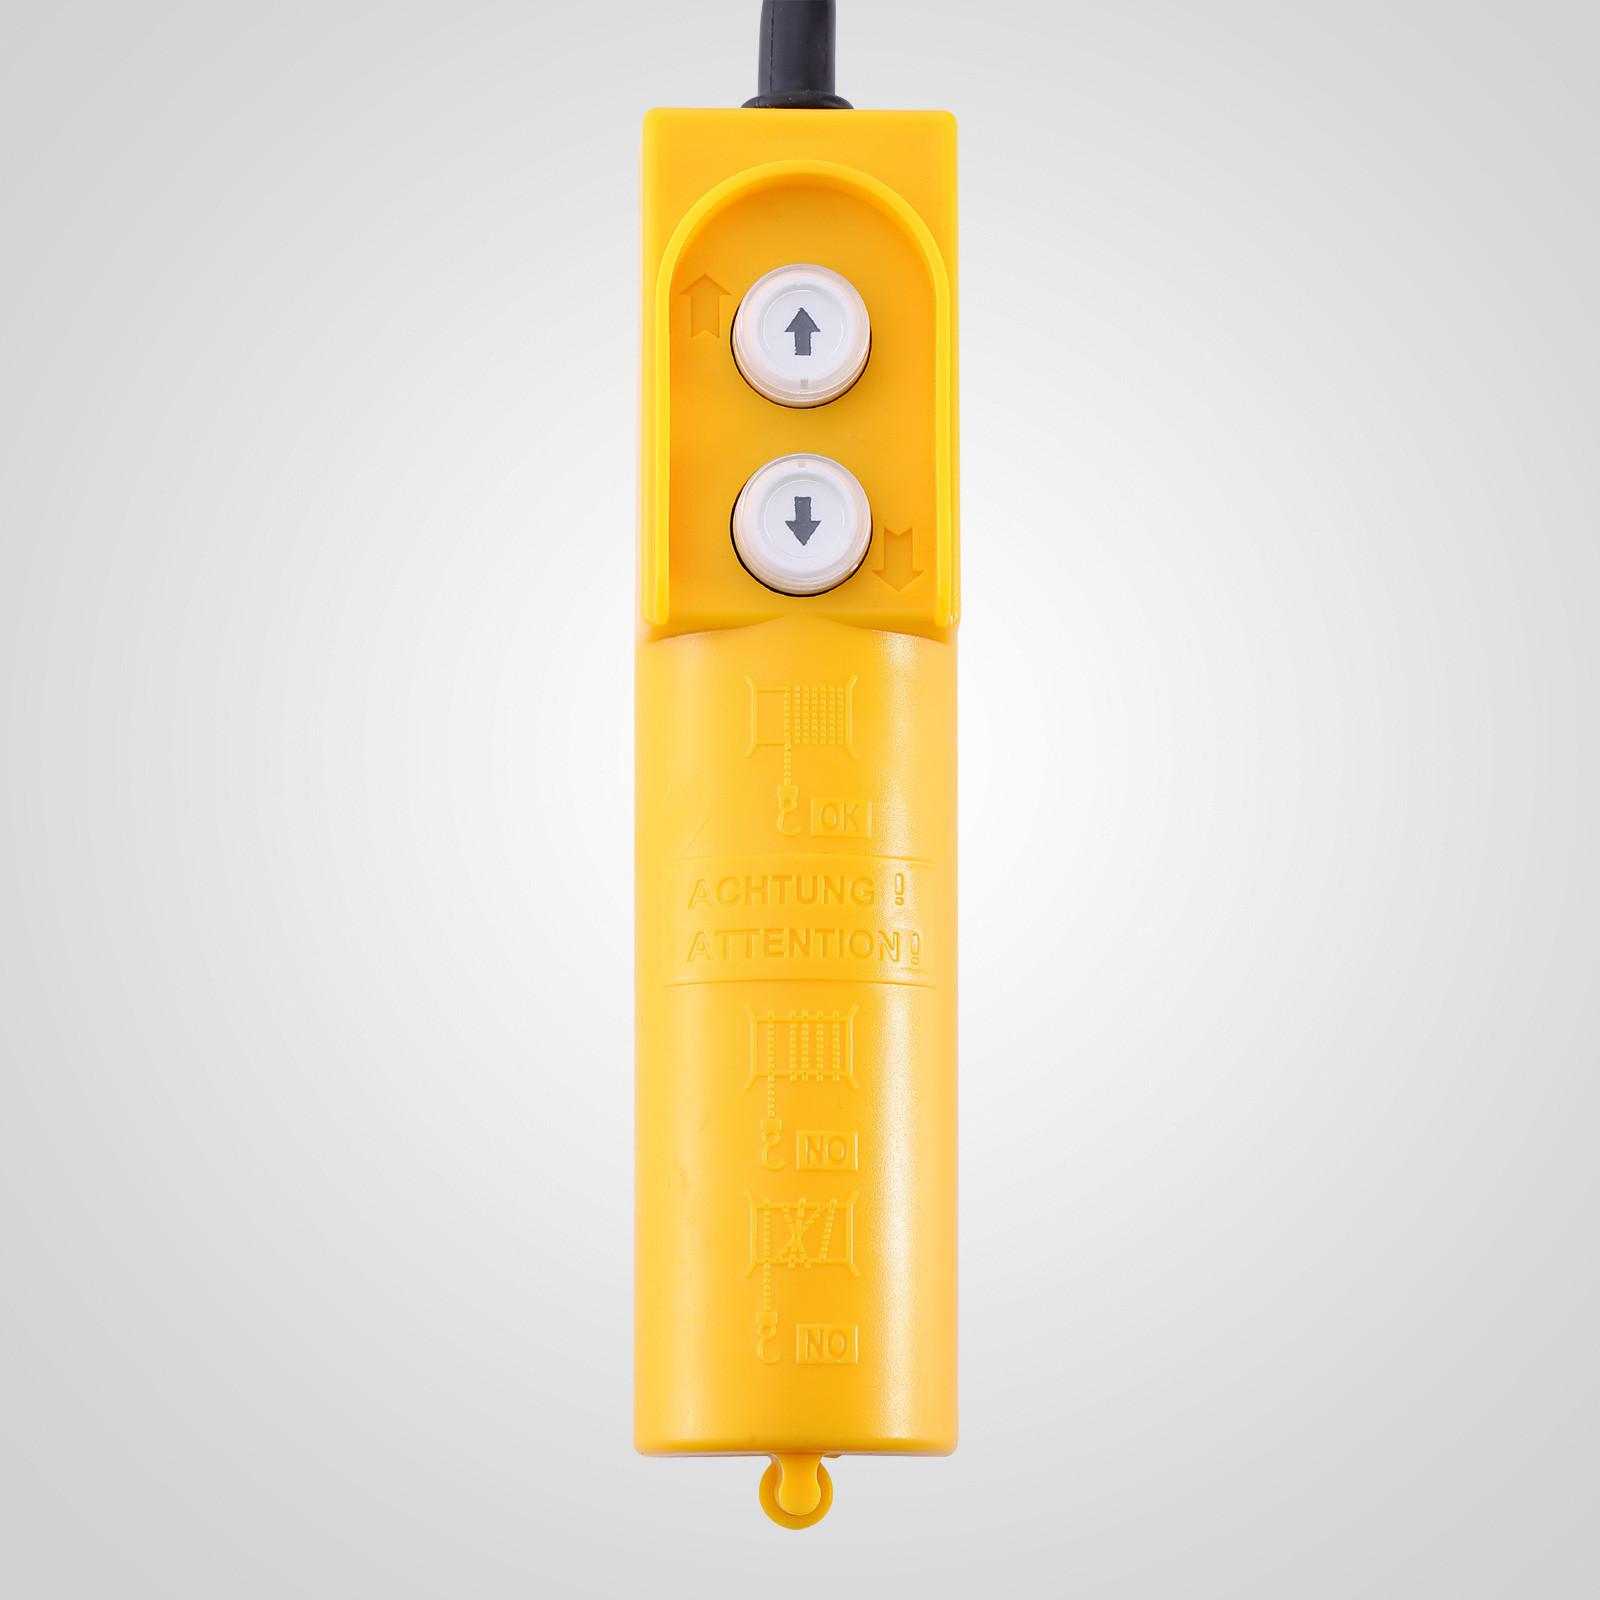 100kg-900kg-Electric-Hoist-Winch-Lifting-Engine-Crane-Cable-Lift-Hook-Garage miniature 47